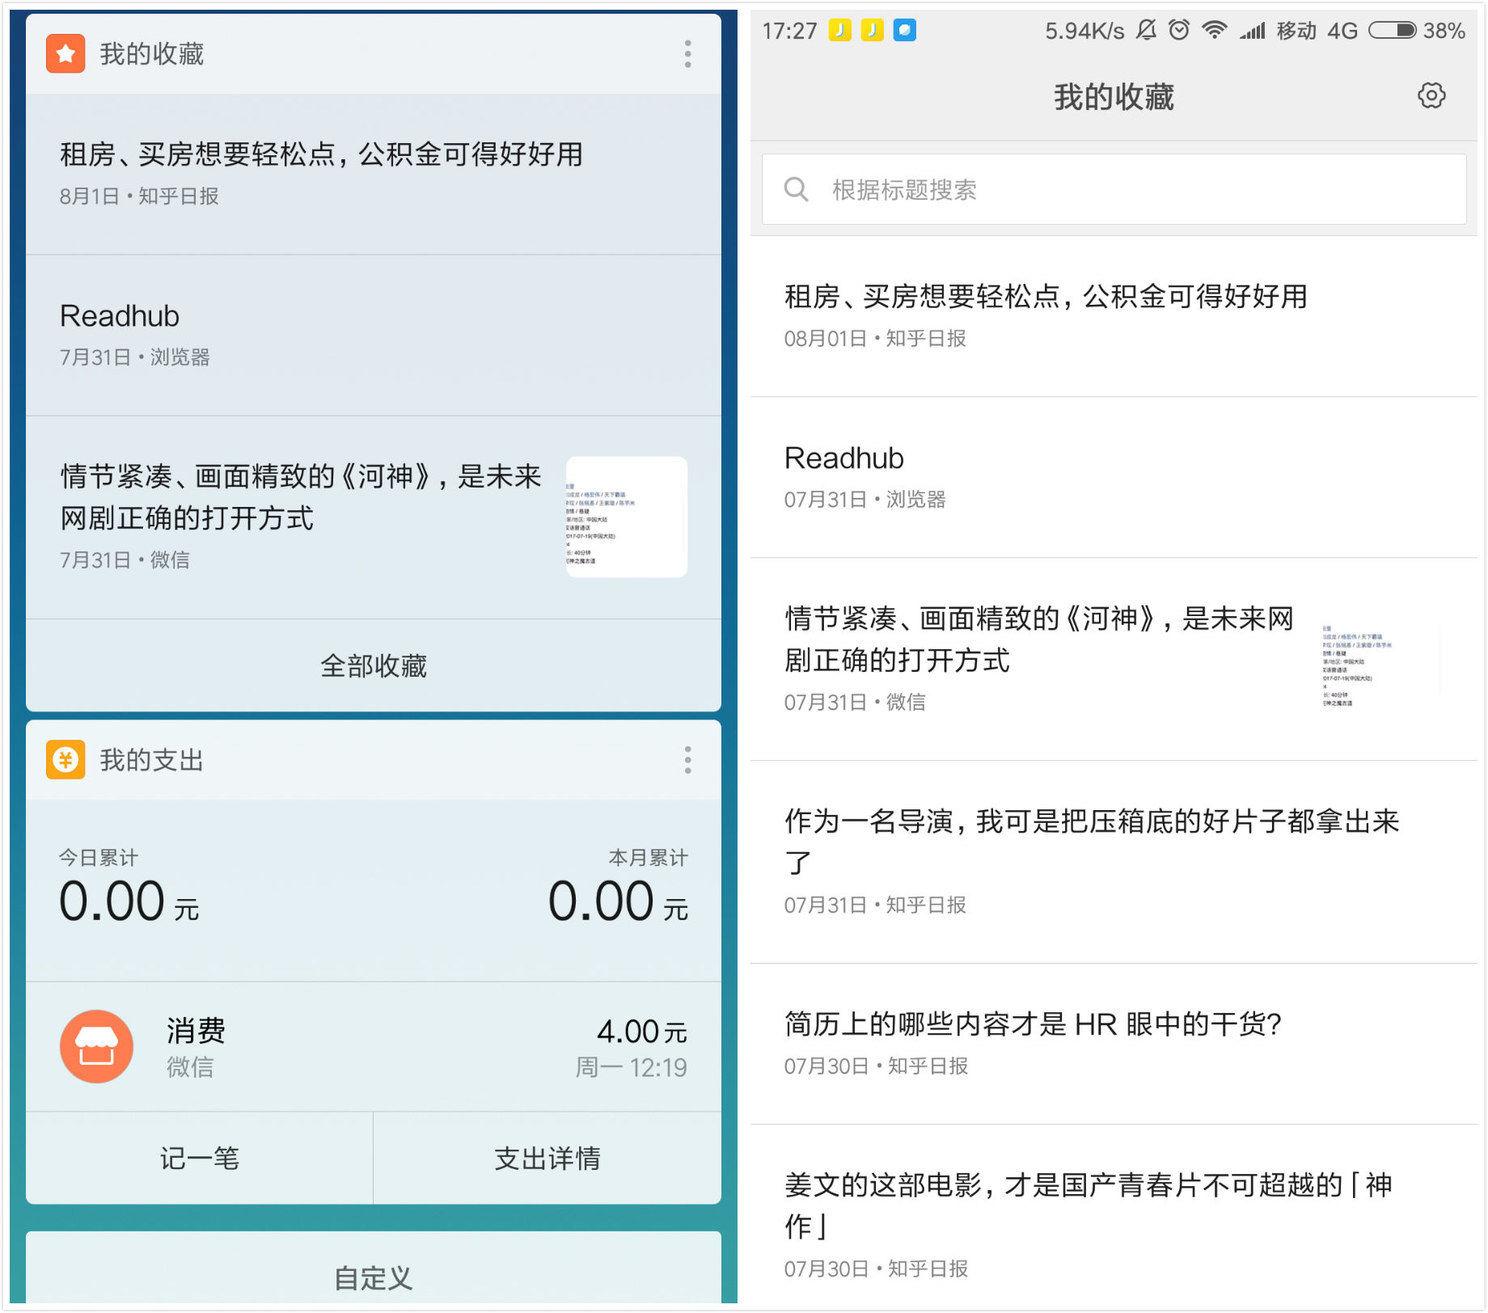 MIUI的过去与未来,雷军是如何使MIUI的全球用户突破 2.8 亿的?